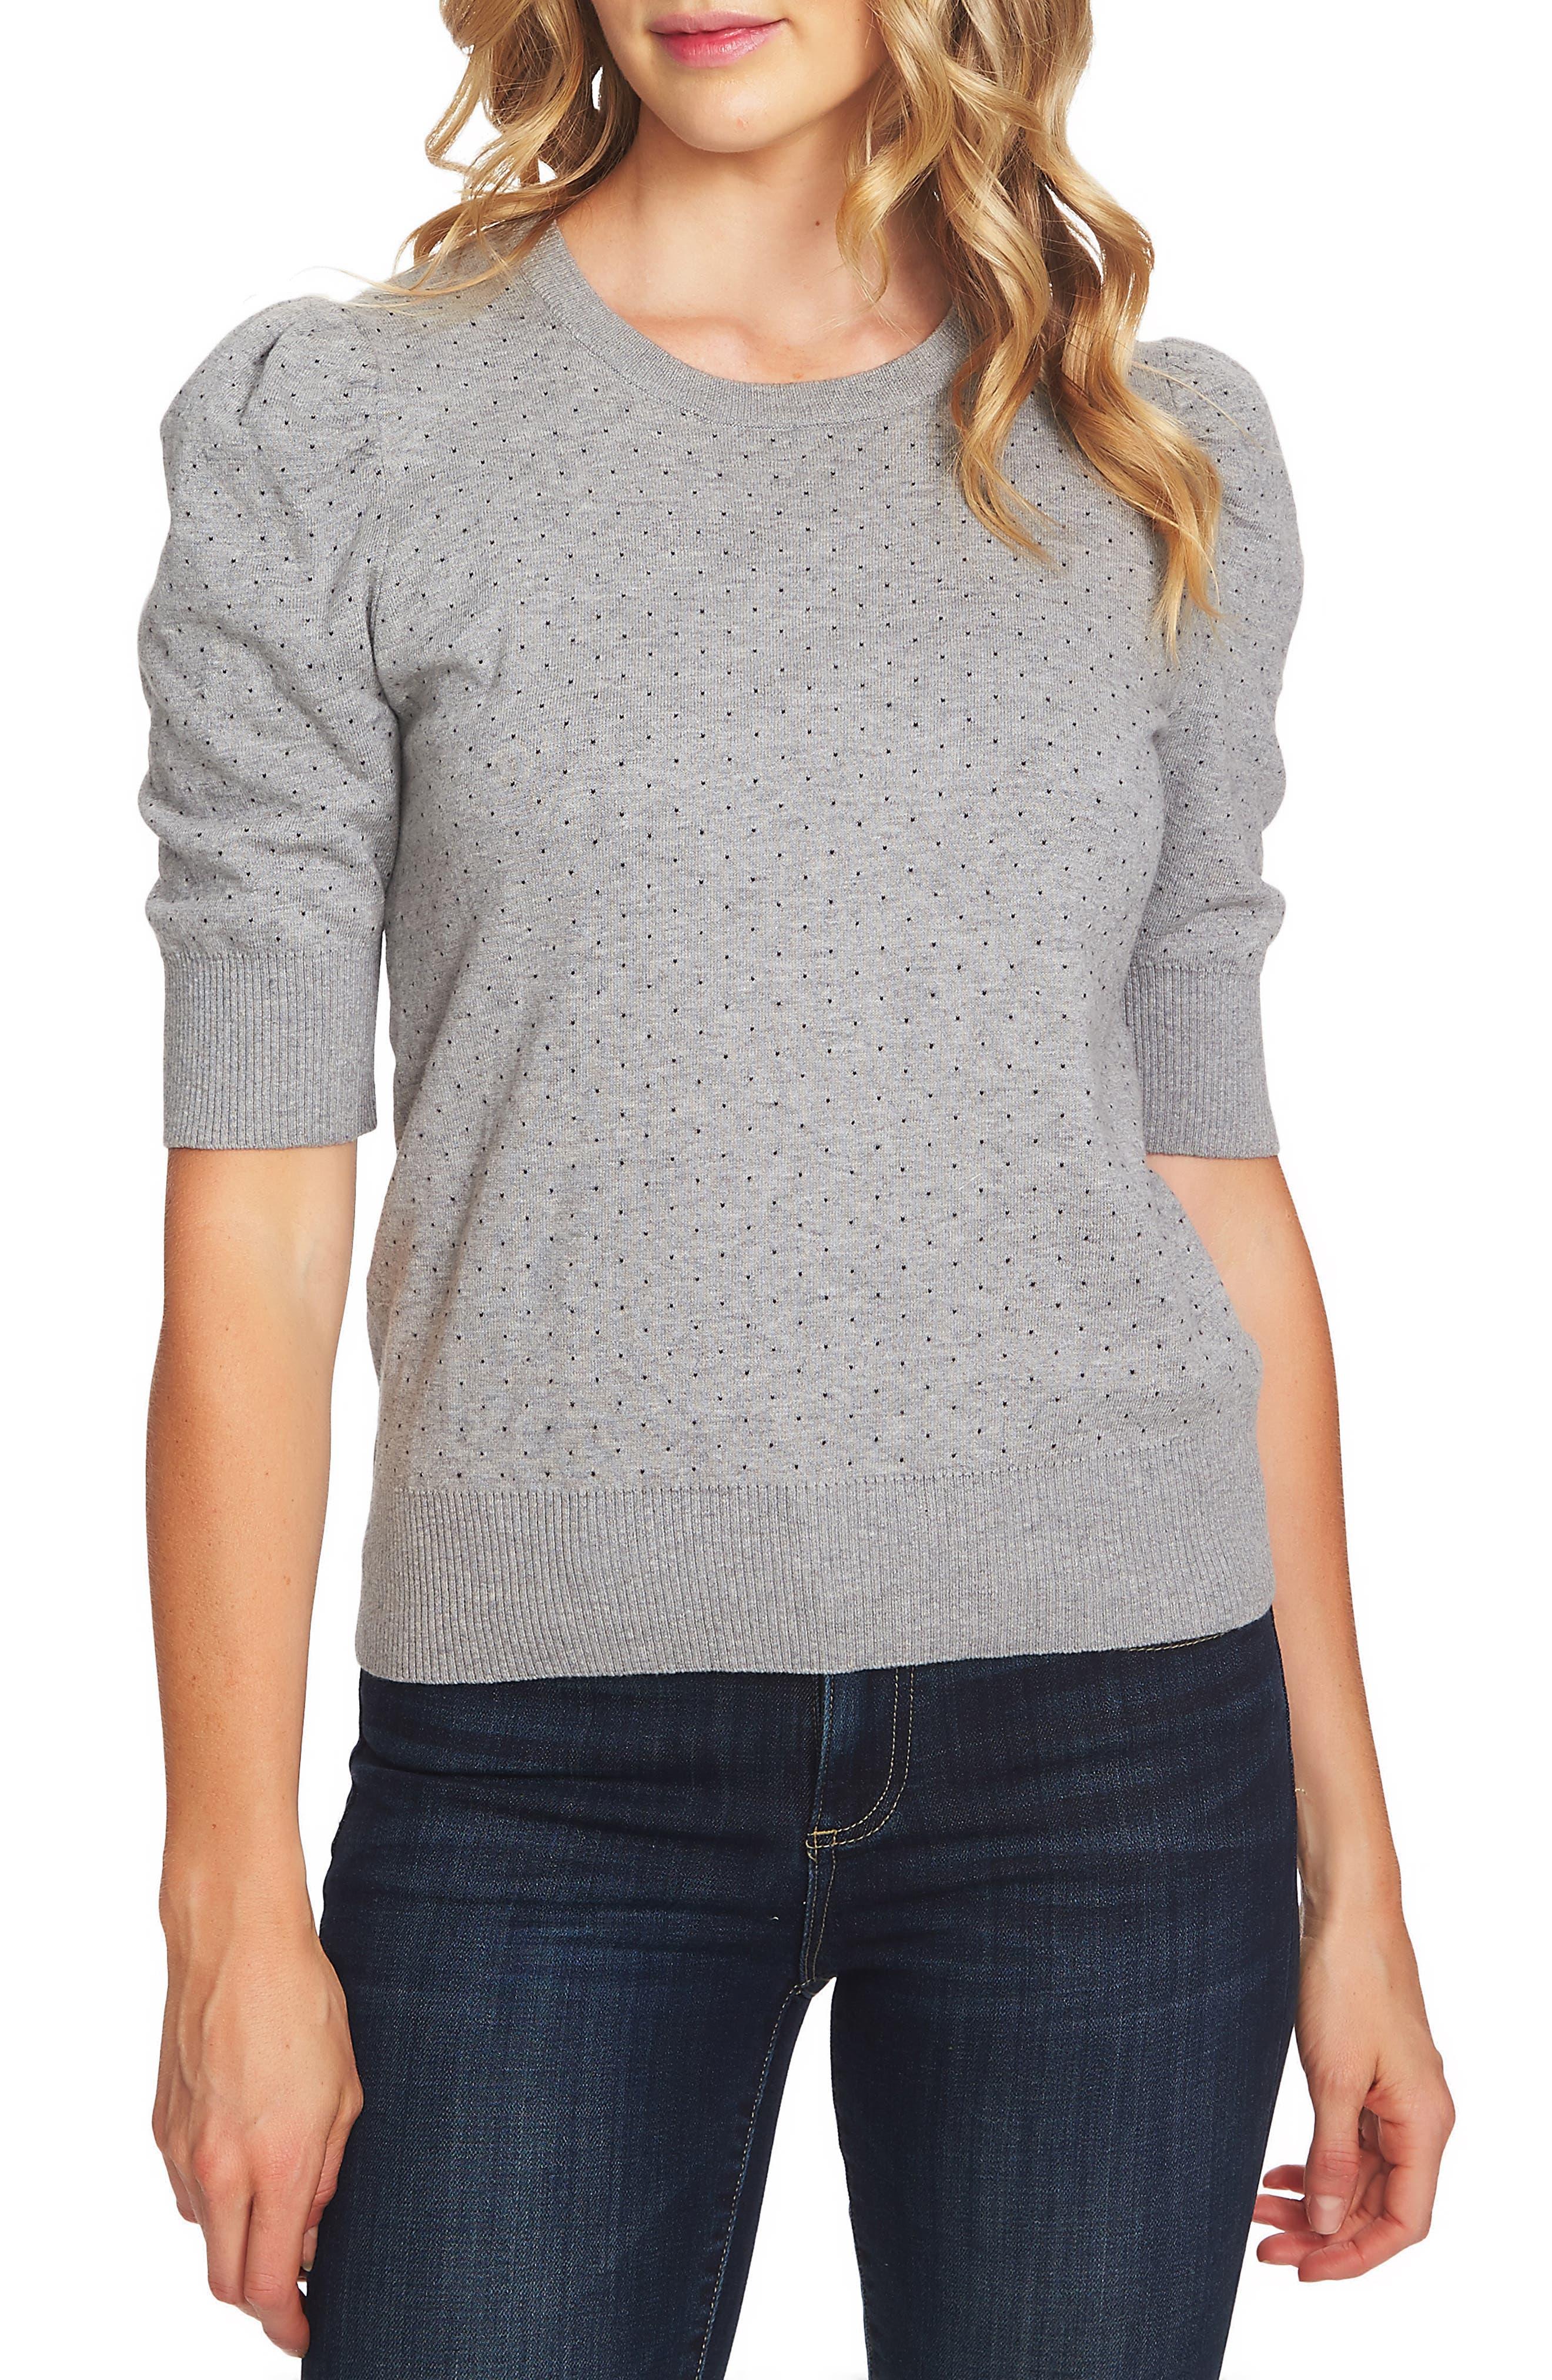 Puffed Sleeve Jacquard Sweater,                             Main thumbnail 1, color,                             LIGHT HEATHER GREY